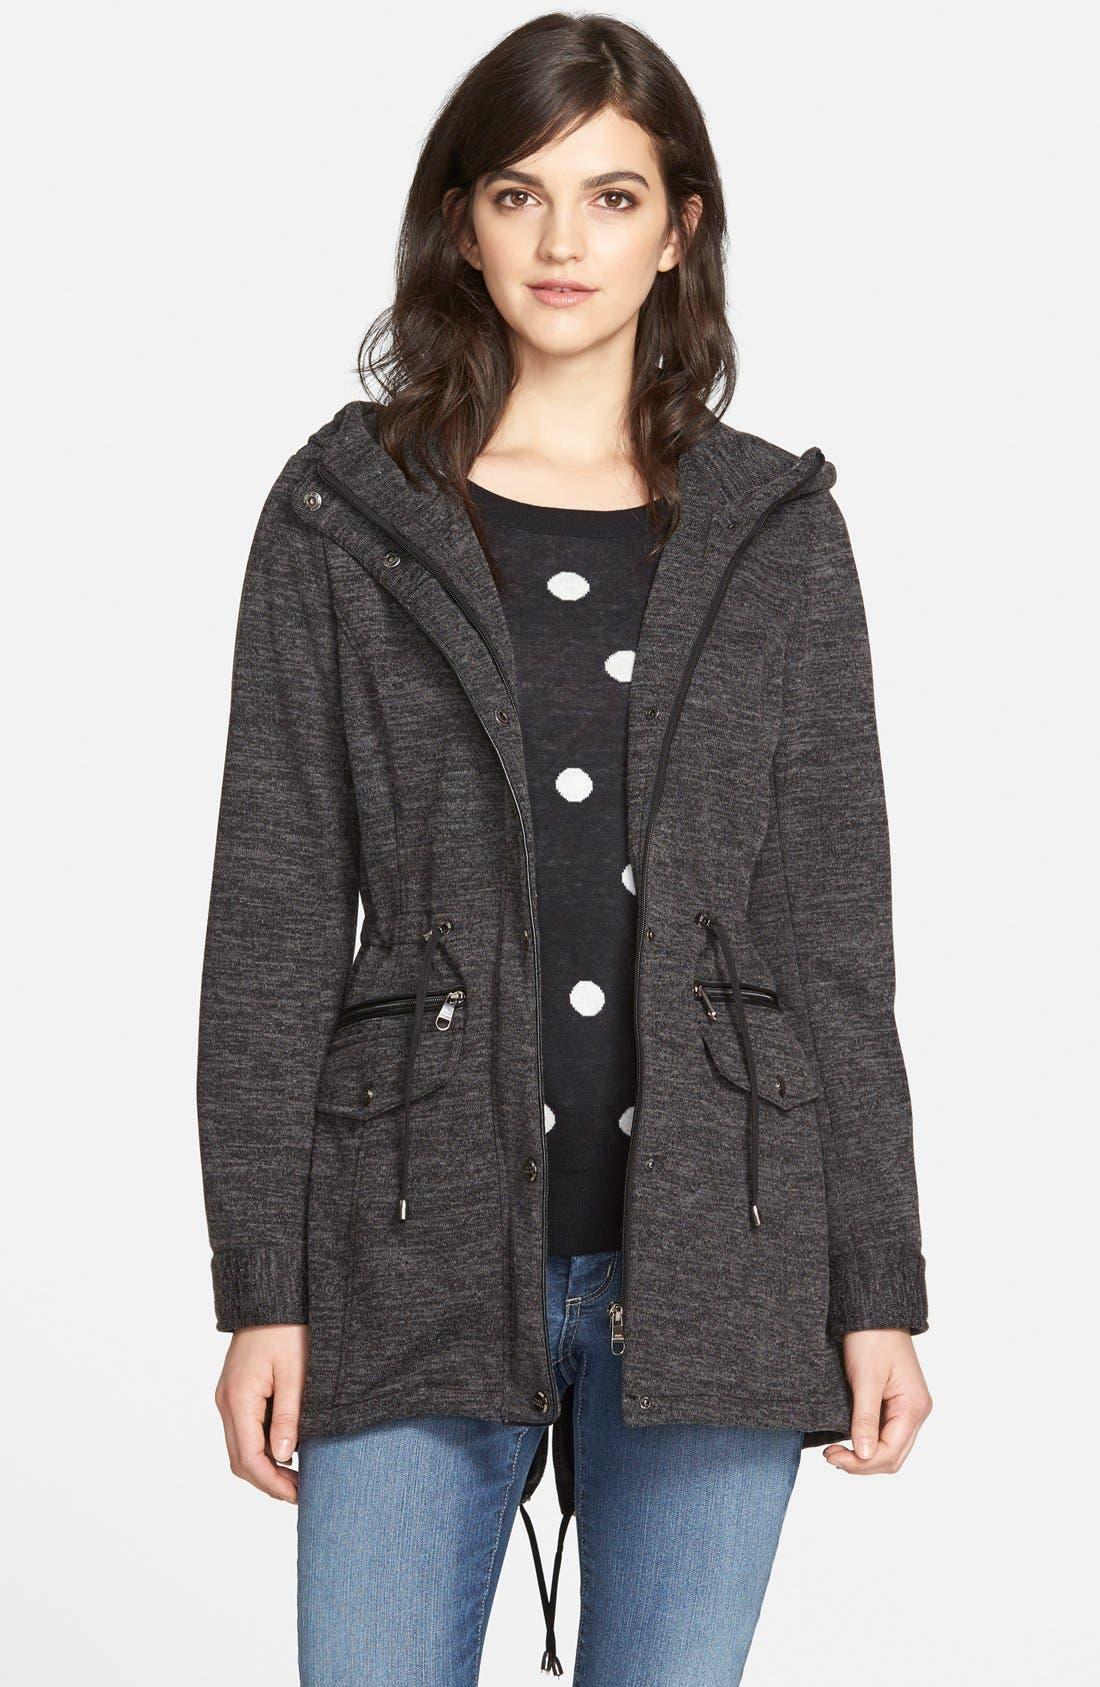 STEVE MADDEN Sweater Knit Anorak, Main, color, 020